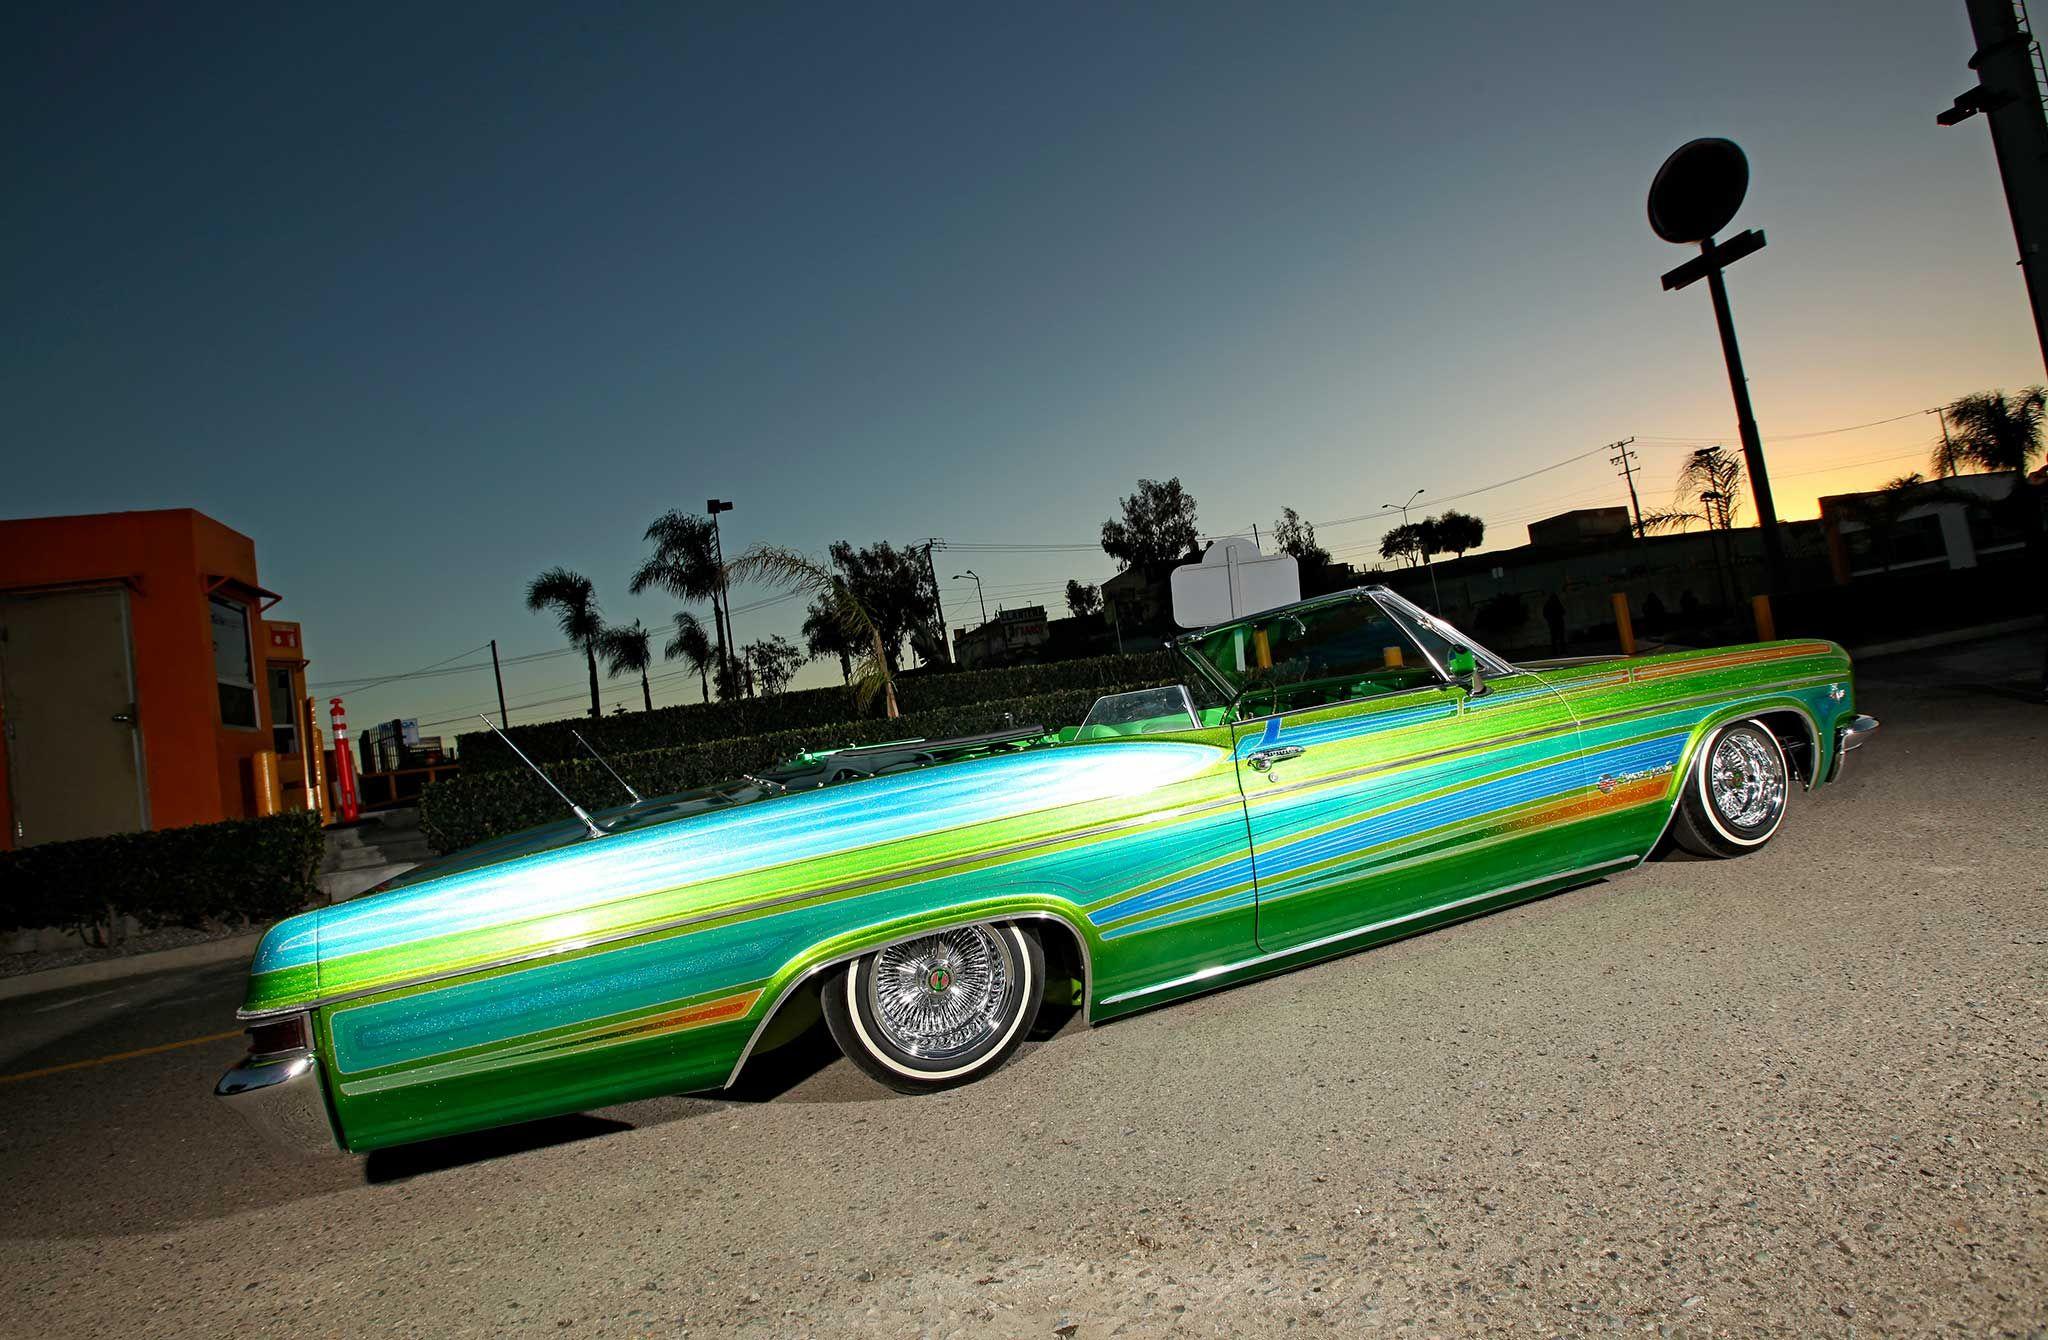 1966 Chevrolet Impala Super Sport Iguana De Tijuana Lowrider